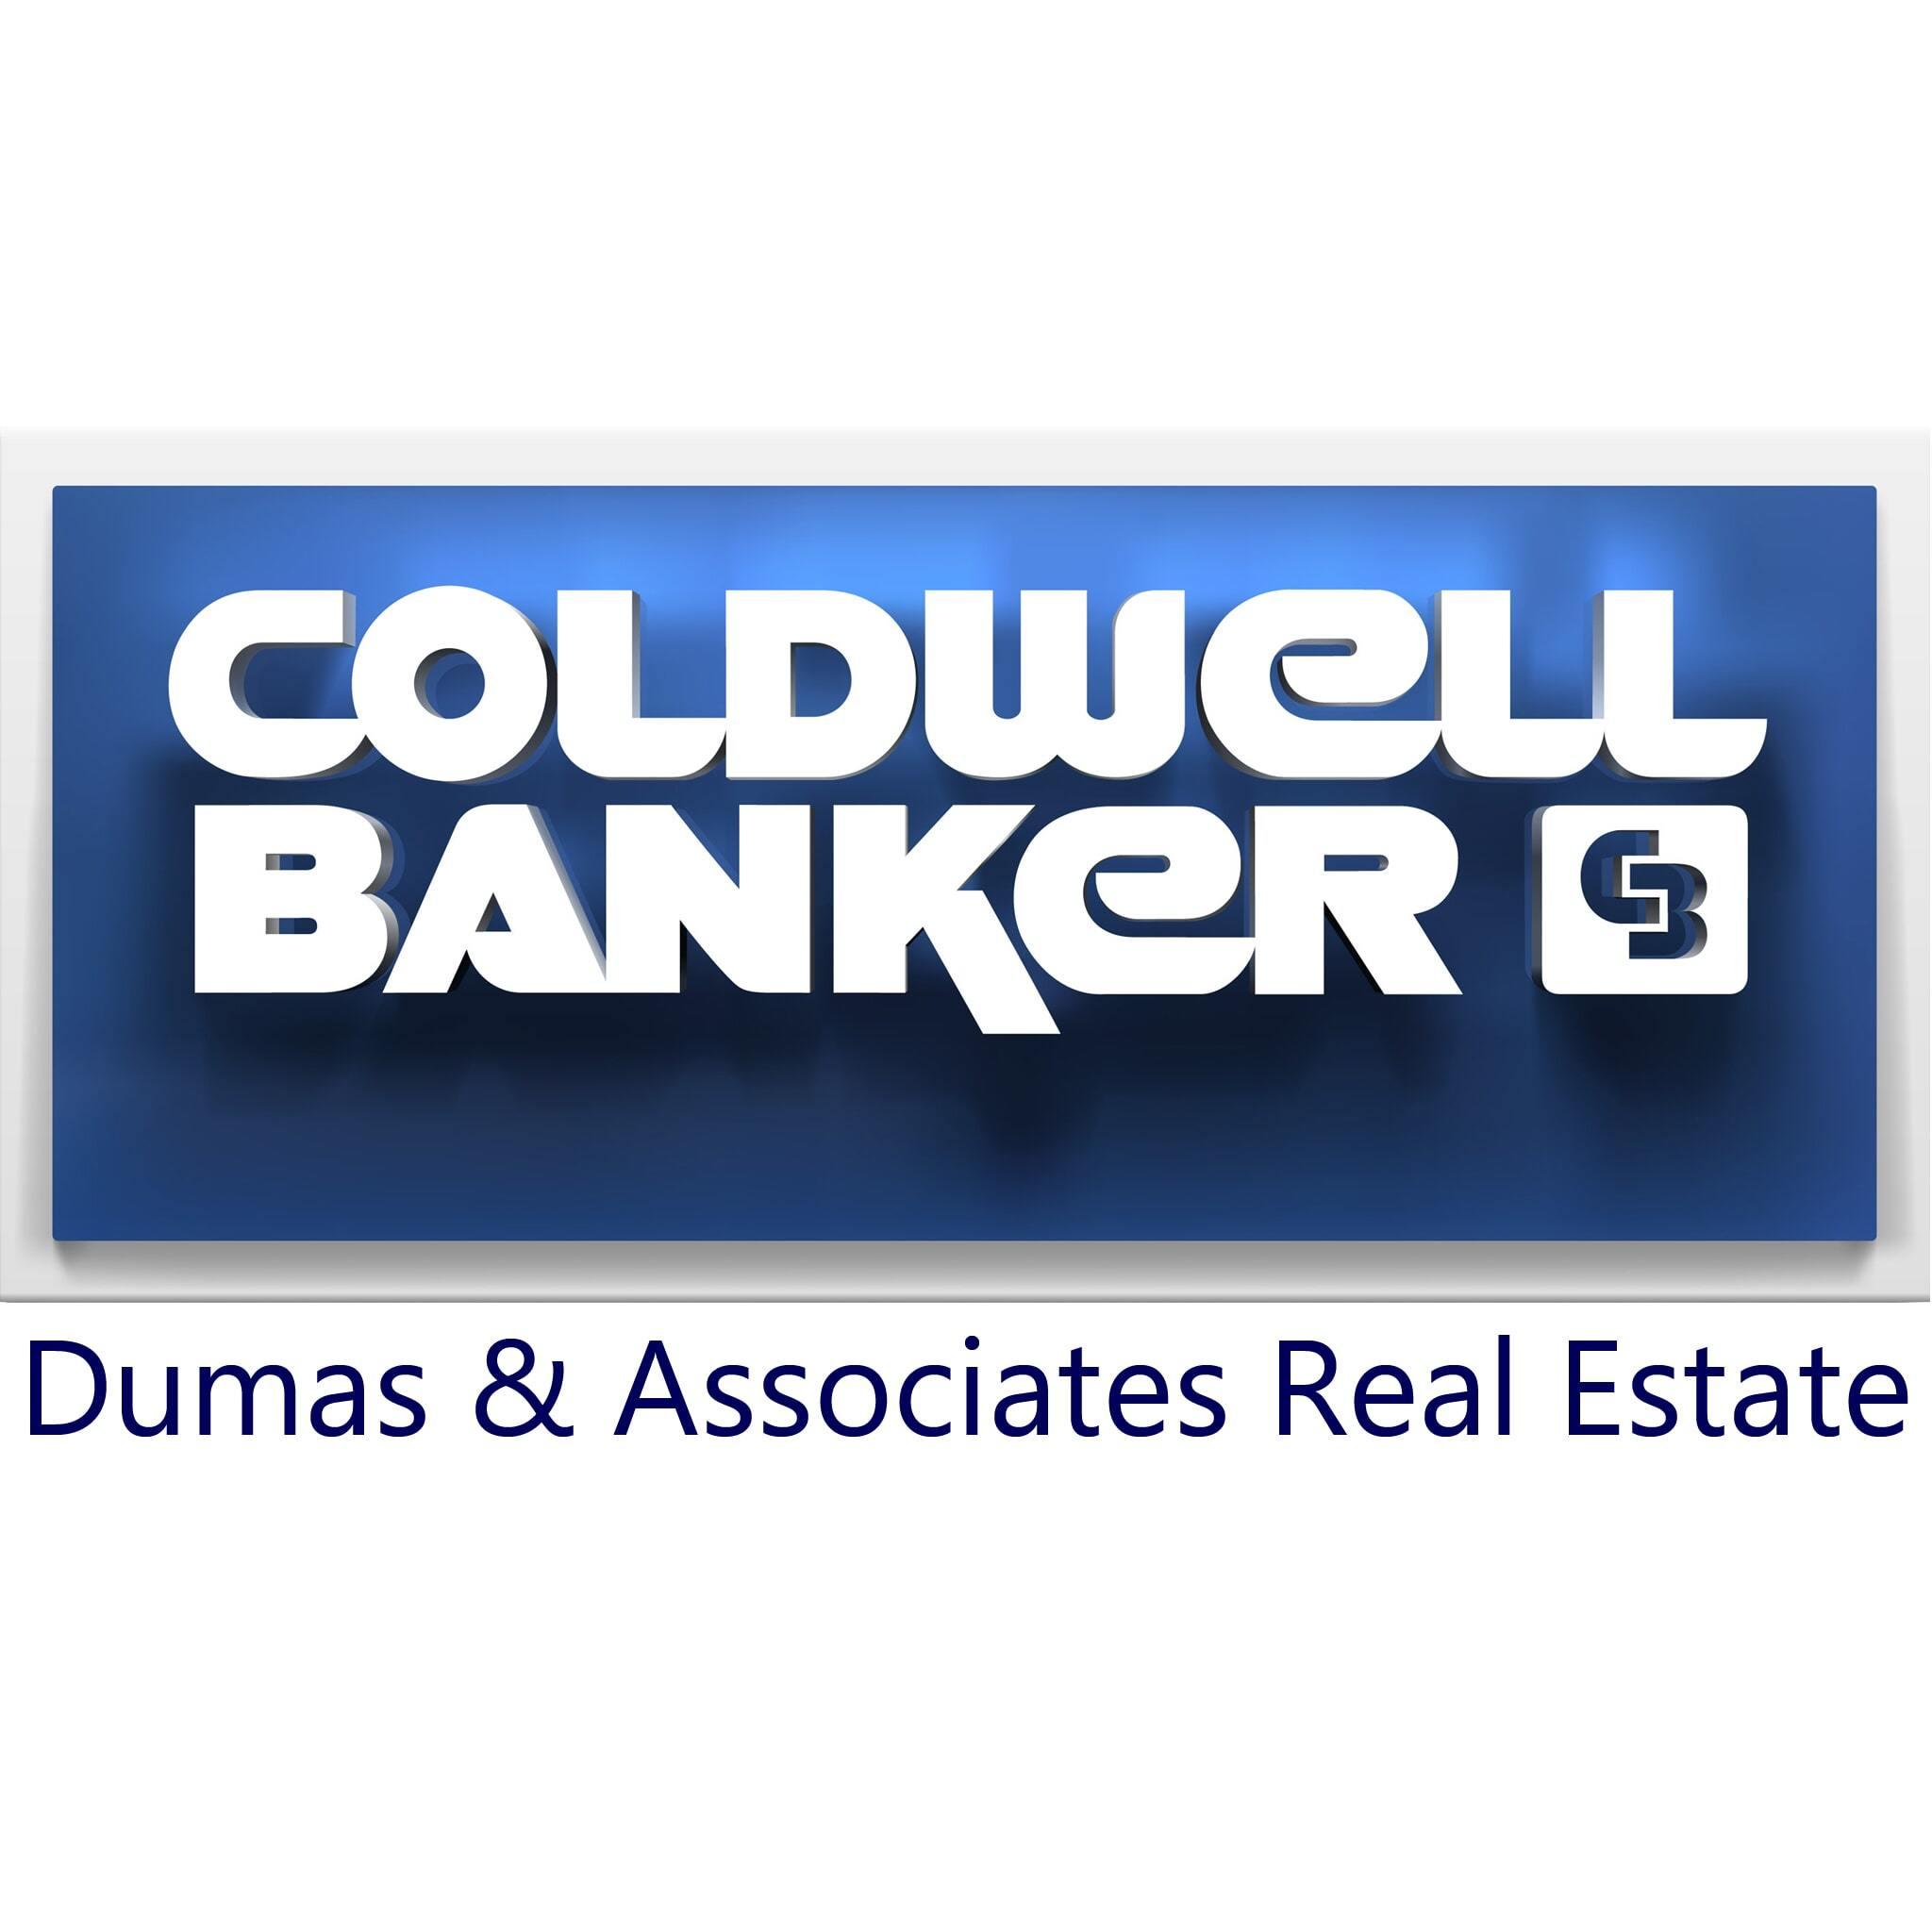 Coldwell Banker Dumas & Associates Real Estate